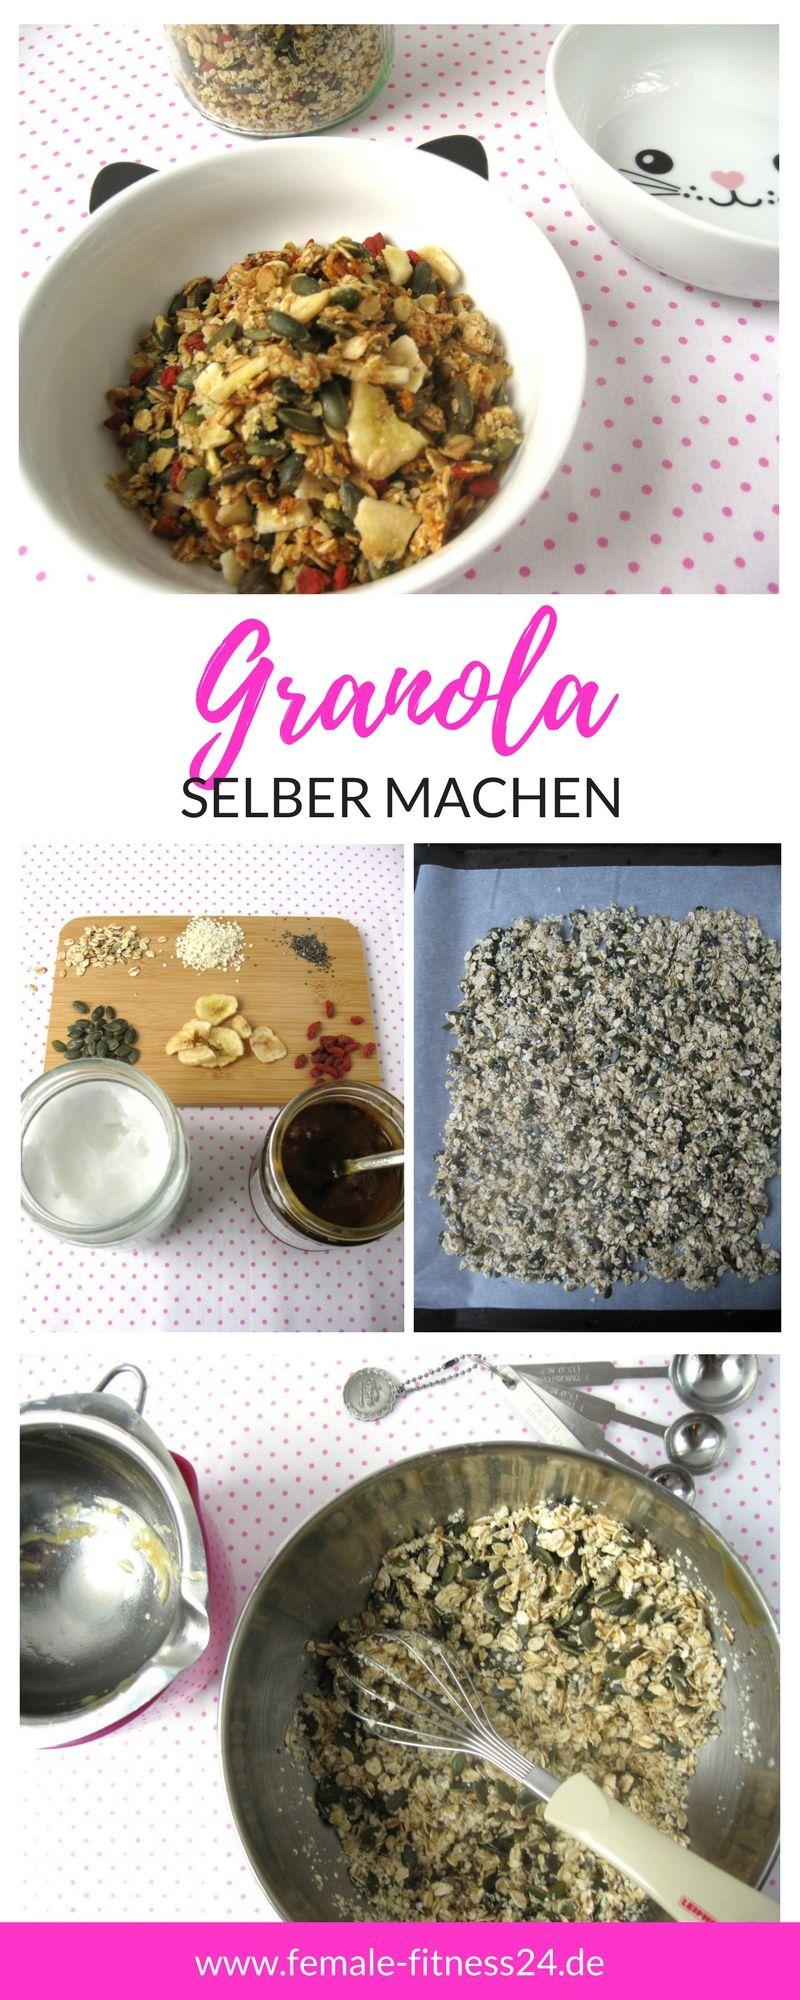 diy granola knusperm sli selber machen rezept ohne kristallzucker blogmix gruppenboard. Black Bedroom Furniture Sets. Home Design Ideas